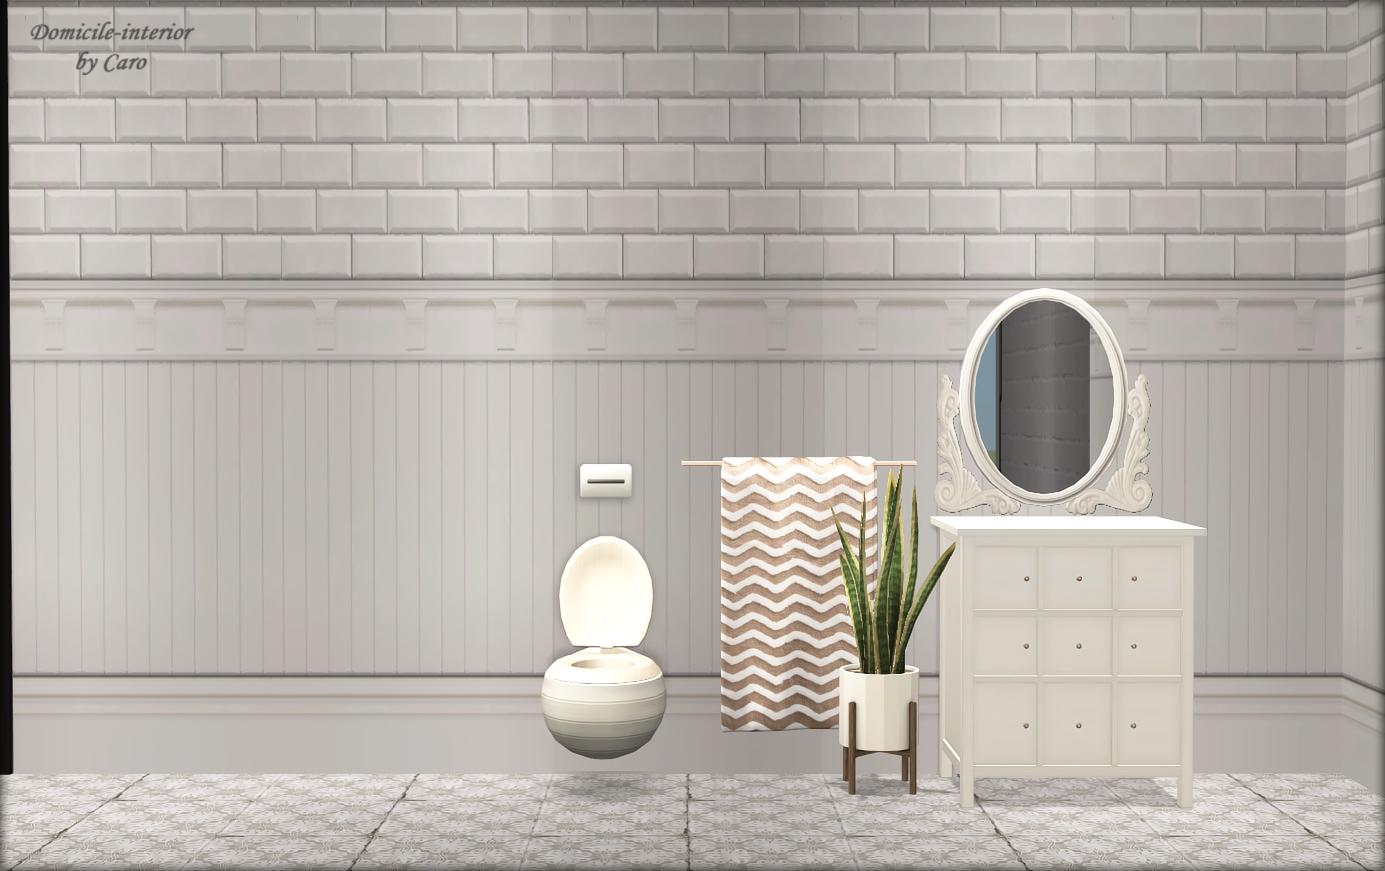 domicile interior ikea. Black Bedroom Furniture Sets. Home Design Ideas